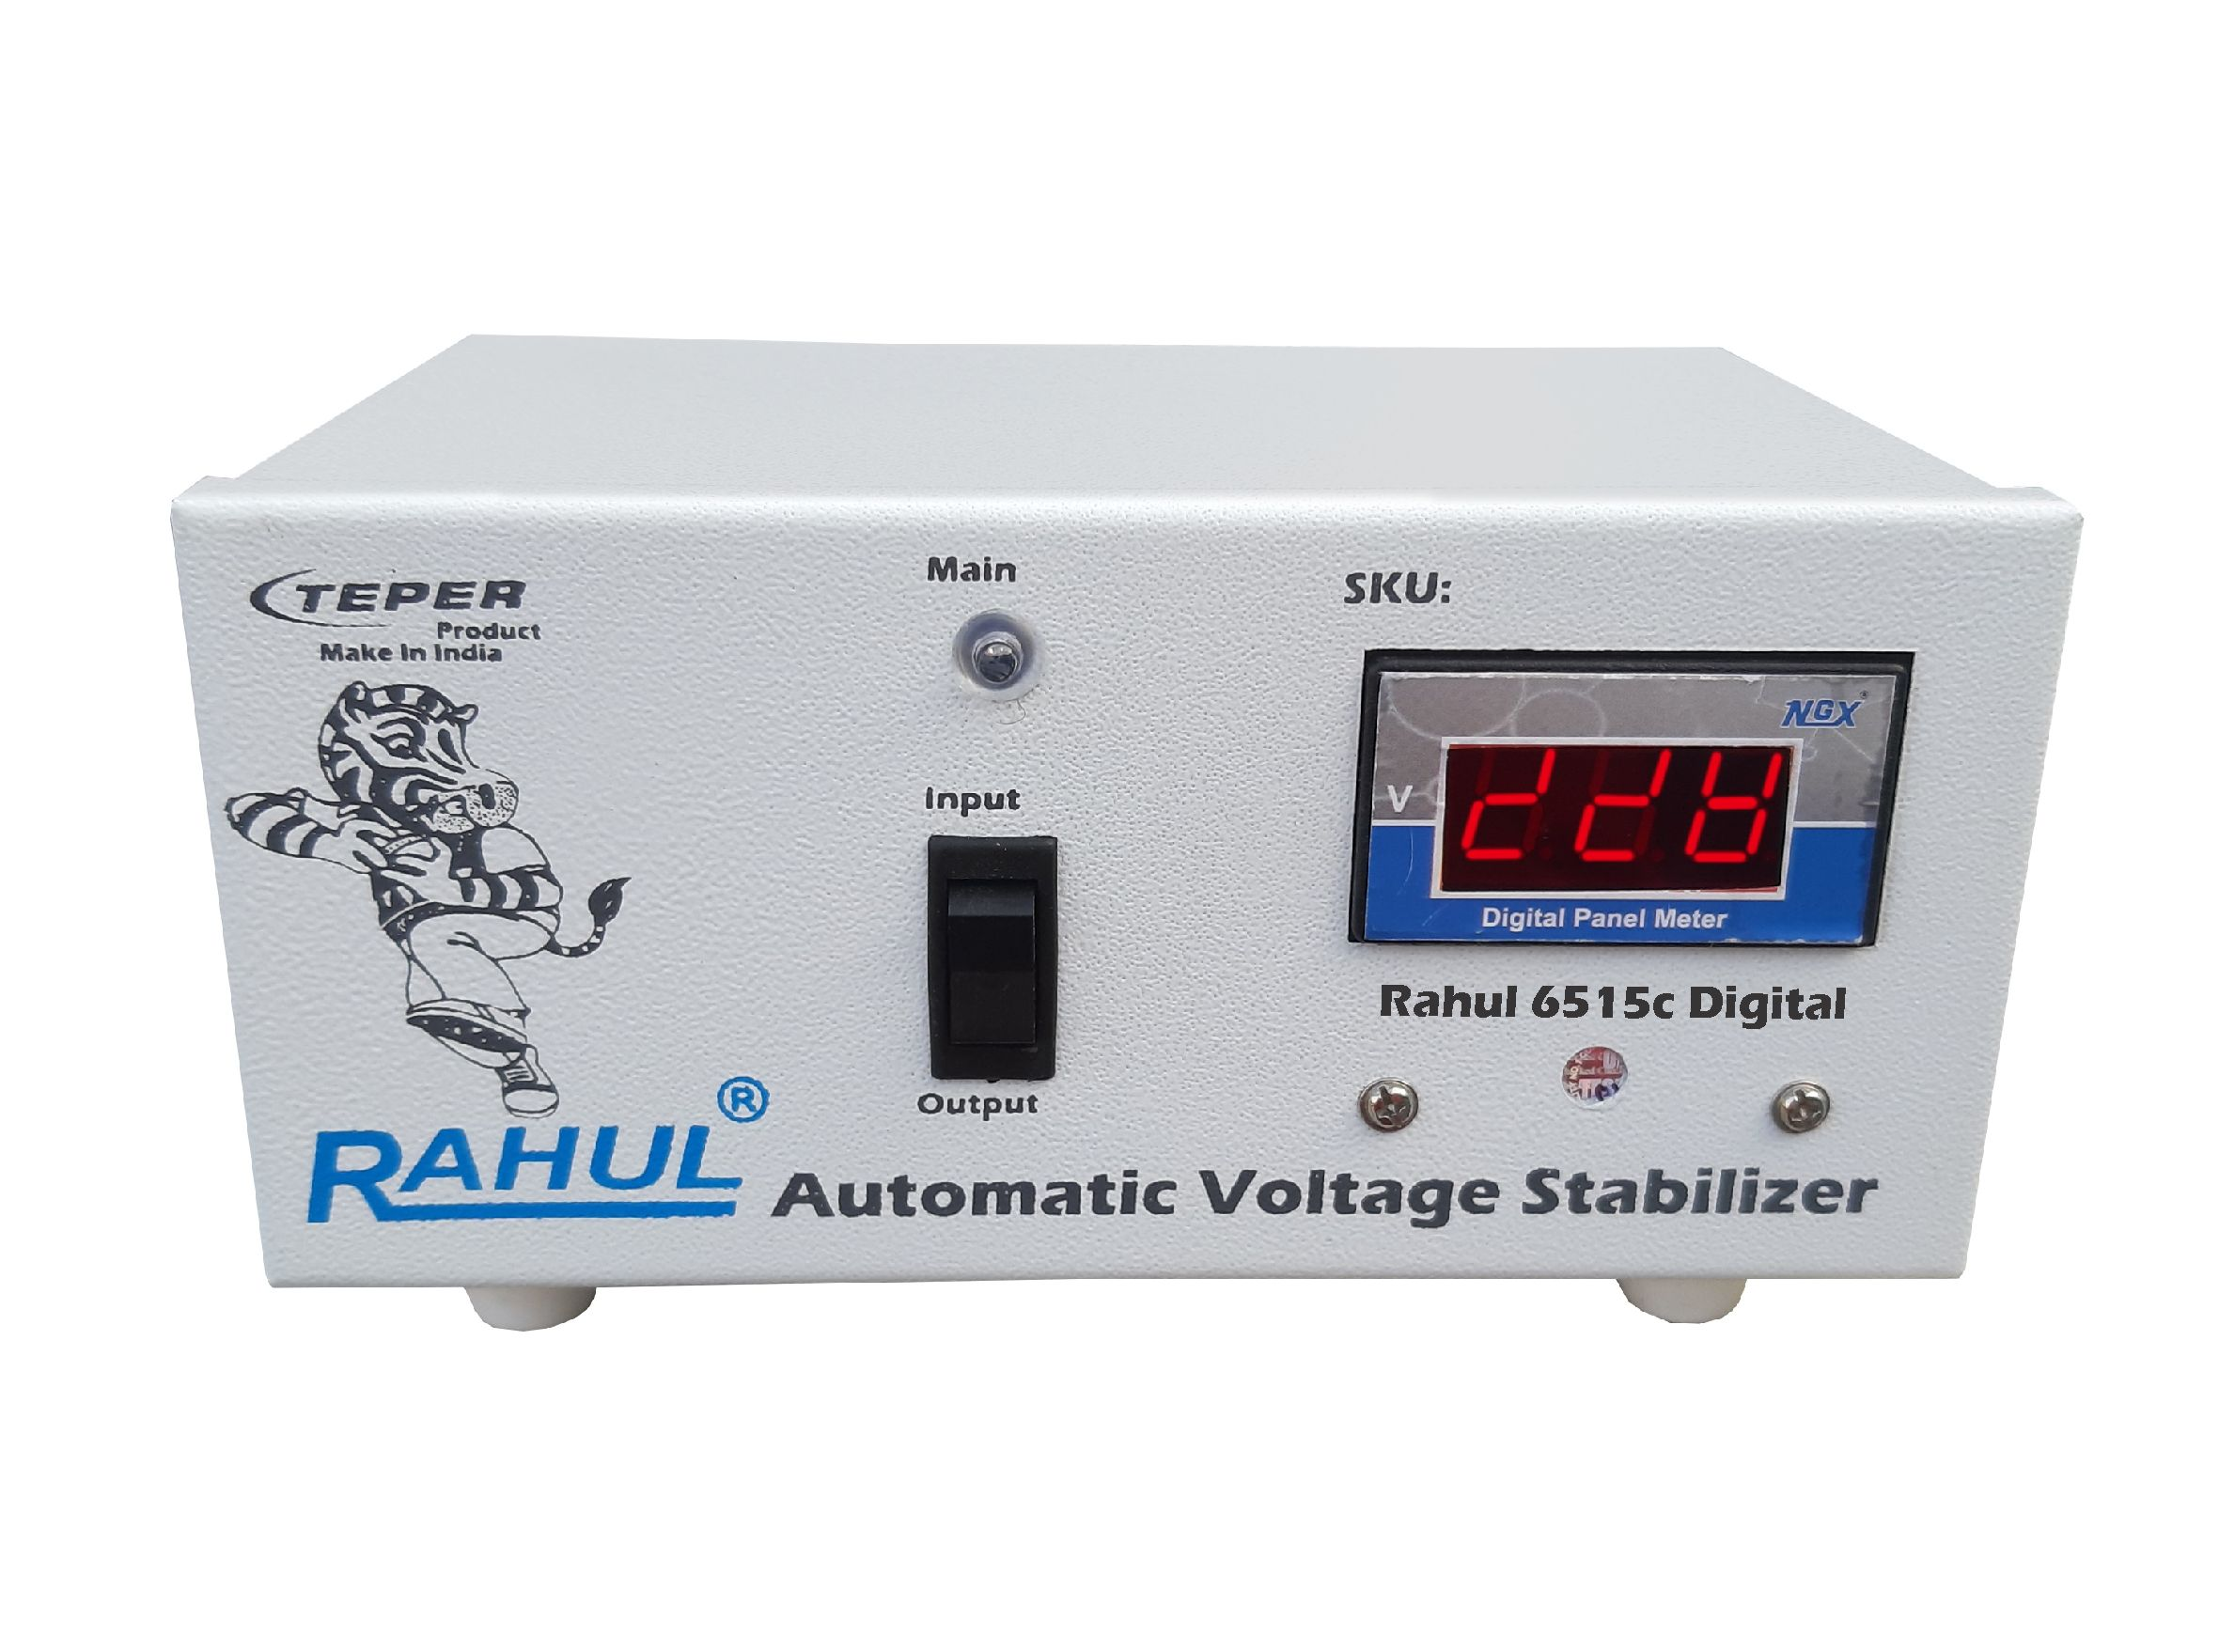 Rahul 6515c Digital 500 VA/1.5 Amp 140 280 Volt 3 Booster Automatic Digital Copper Voltage Stabilizer